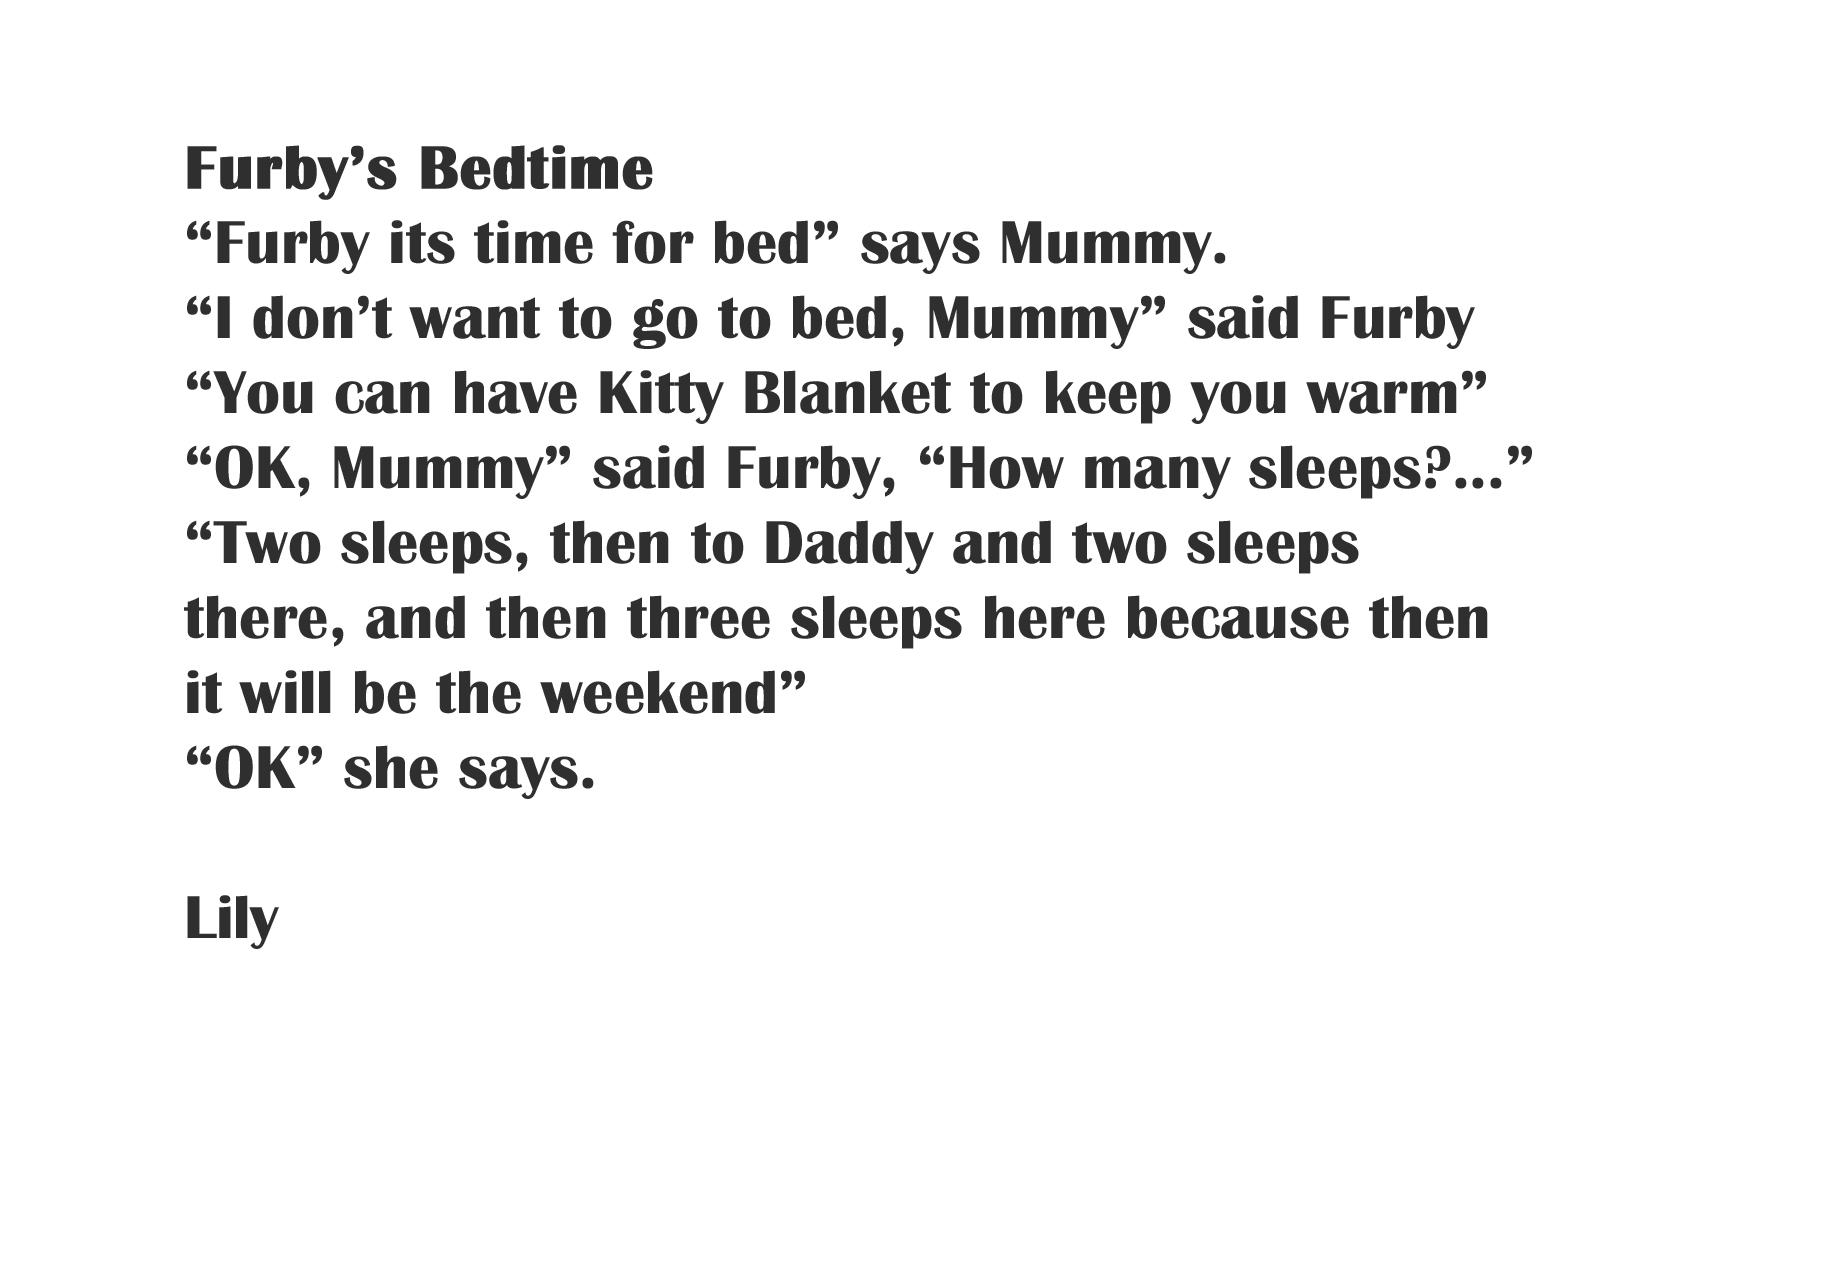 Furby's bedtime.jpg